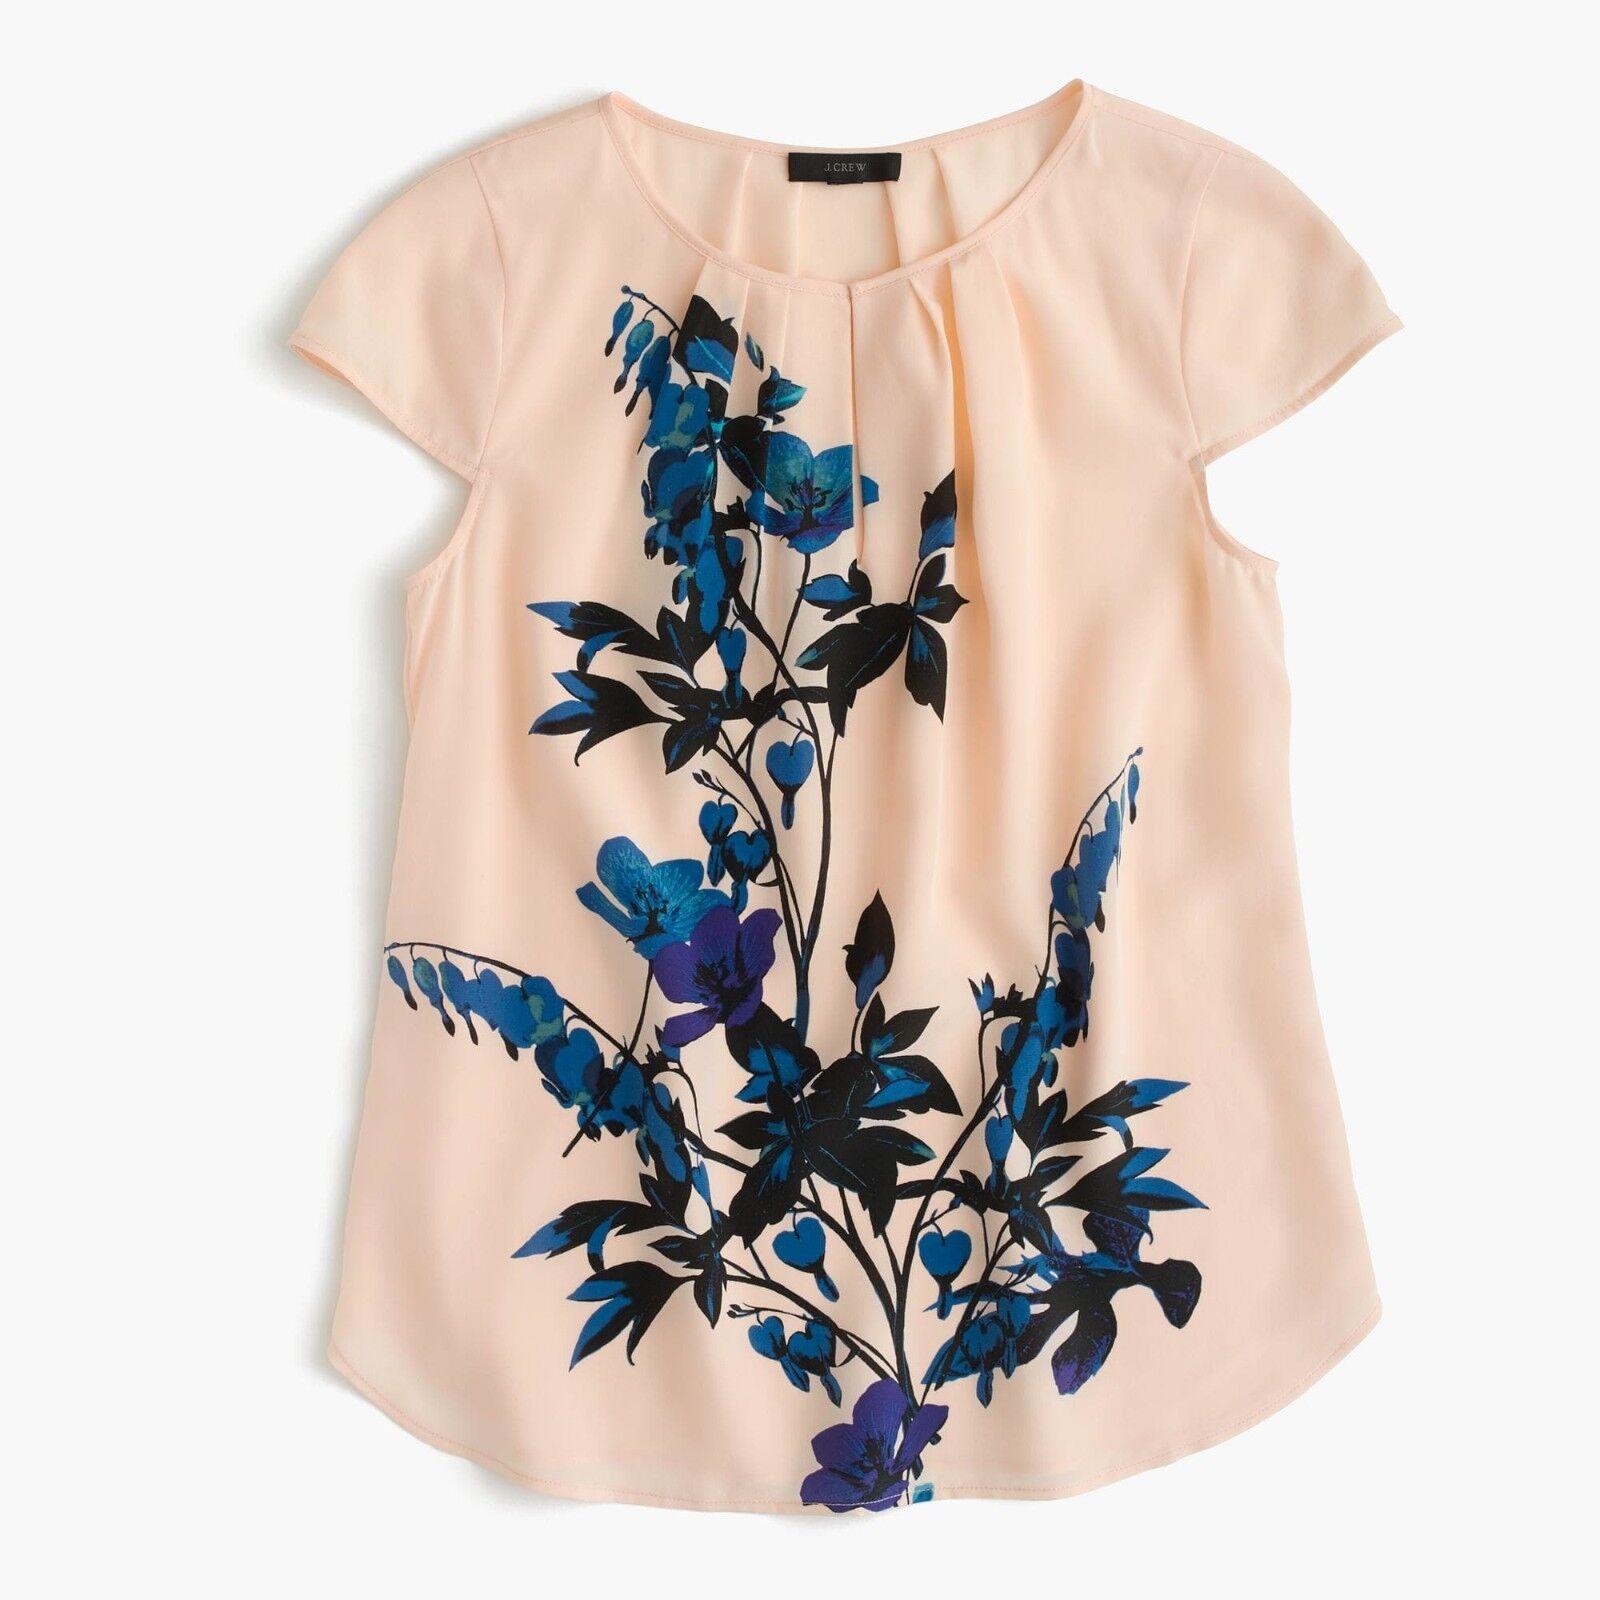 J.Crew Silk cap-sleeve top in midnight bloom - NWT  - Größe 00,0,2,4,6